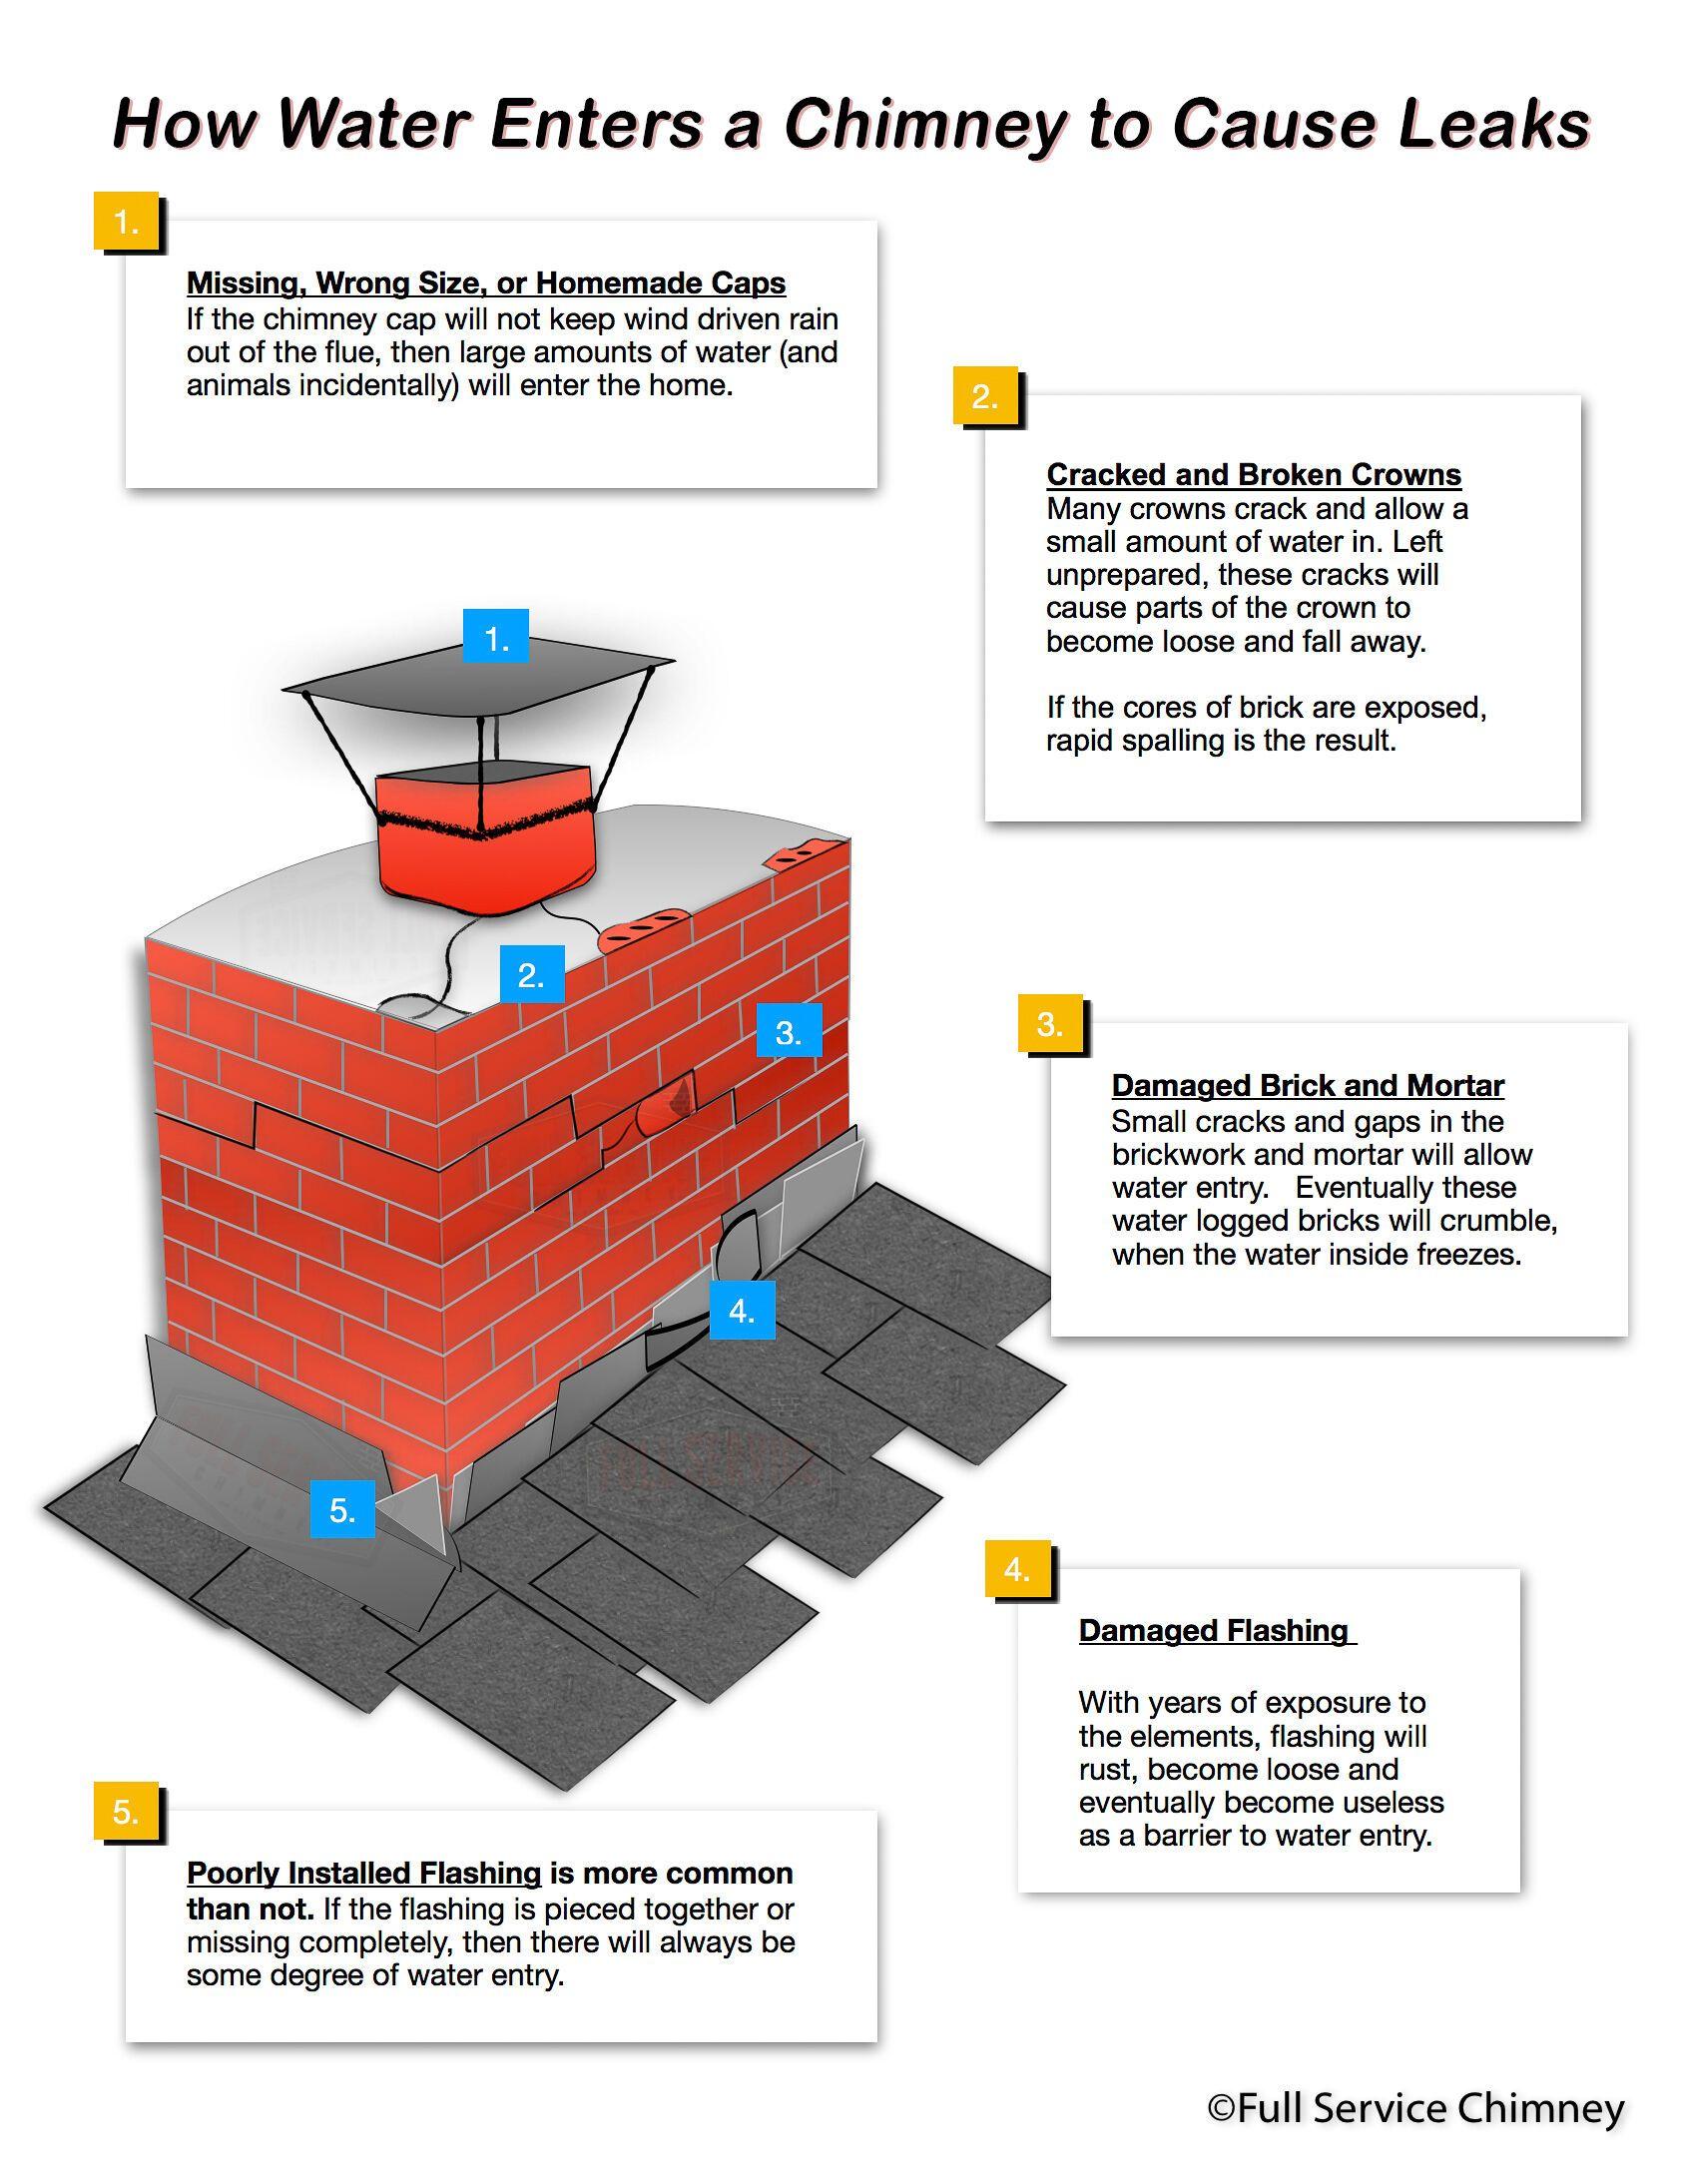 How To Fix Chimney Leaks Leak Repair Leaks Mortar Repair